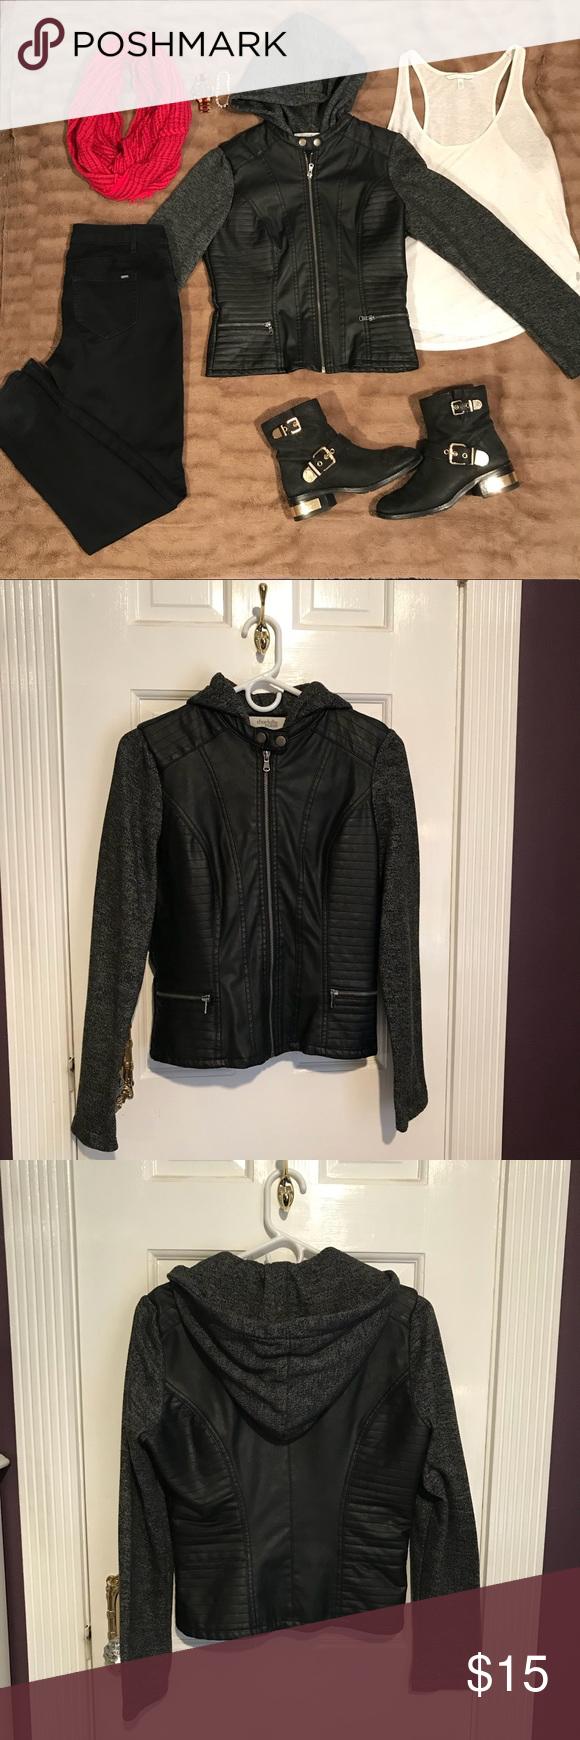 Hooded Jacket Faux Leather Sweatshirt Jacket Fashion Leather Sweatshirt Clothes Design [ 1740 x 580 Pixel ]